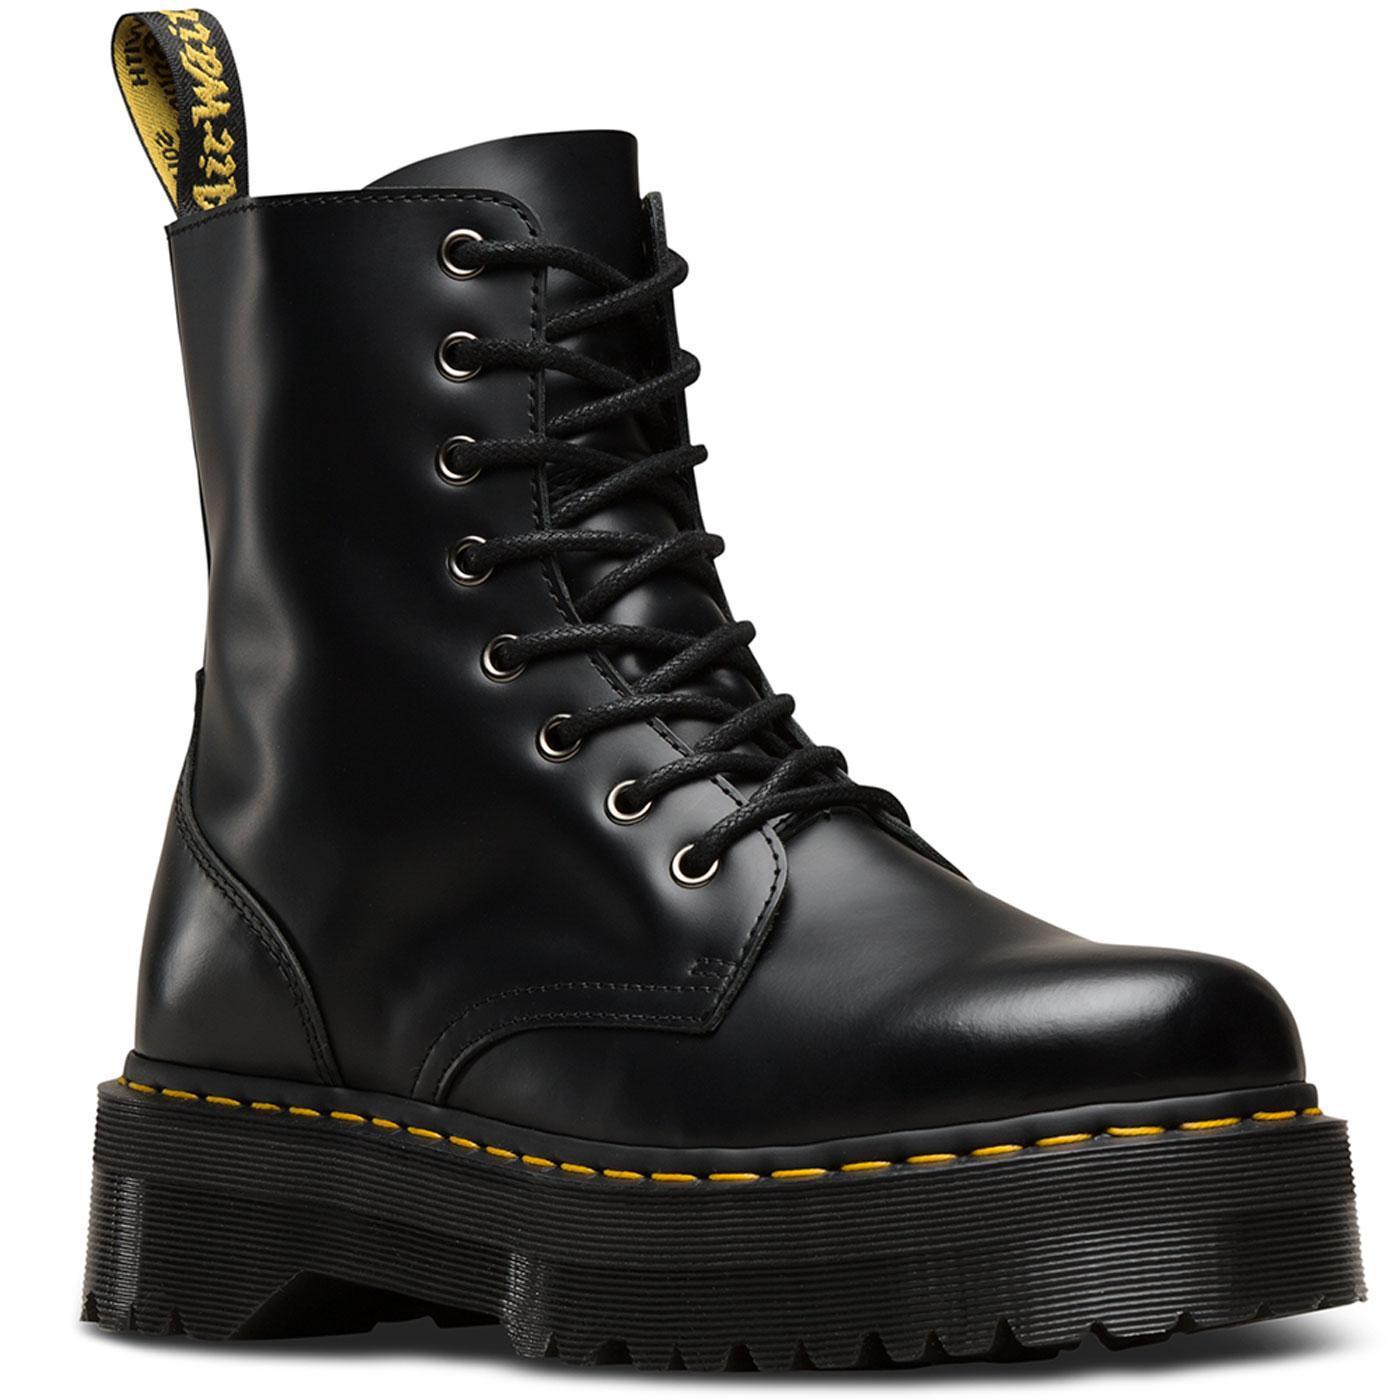 DR MARTENS 'Jadon' Women's Punk Platform Boots in Black